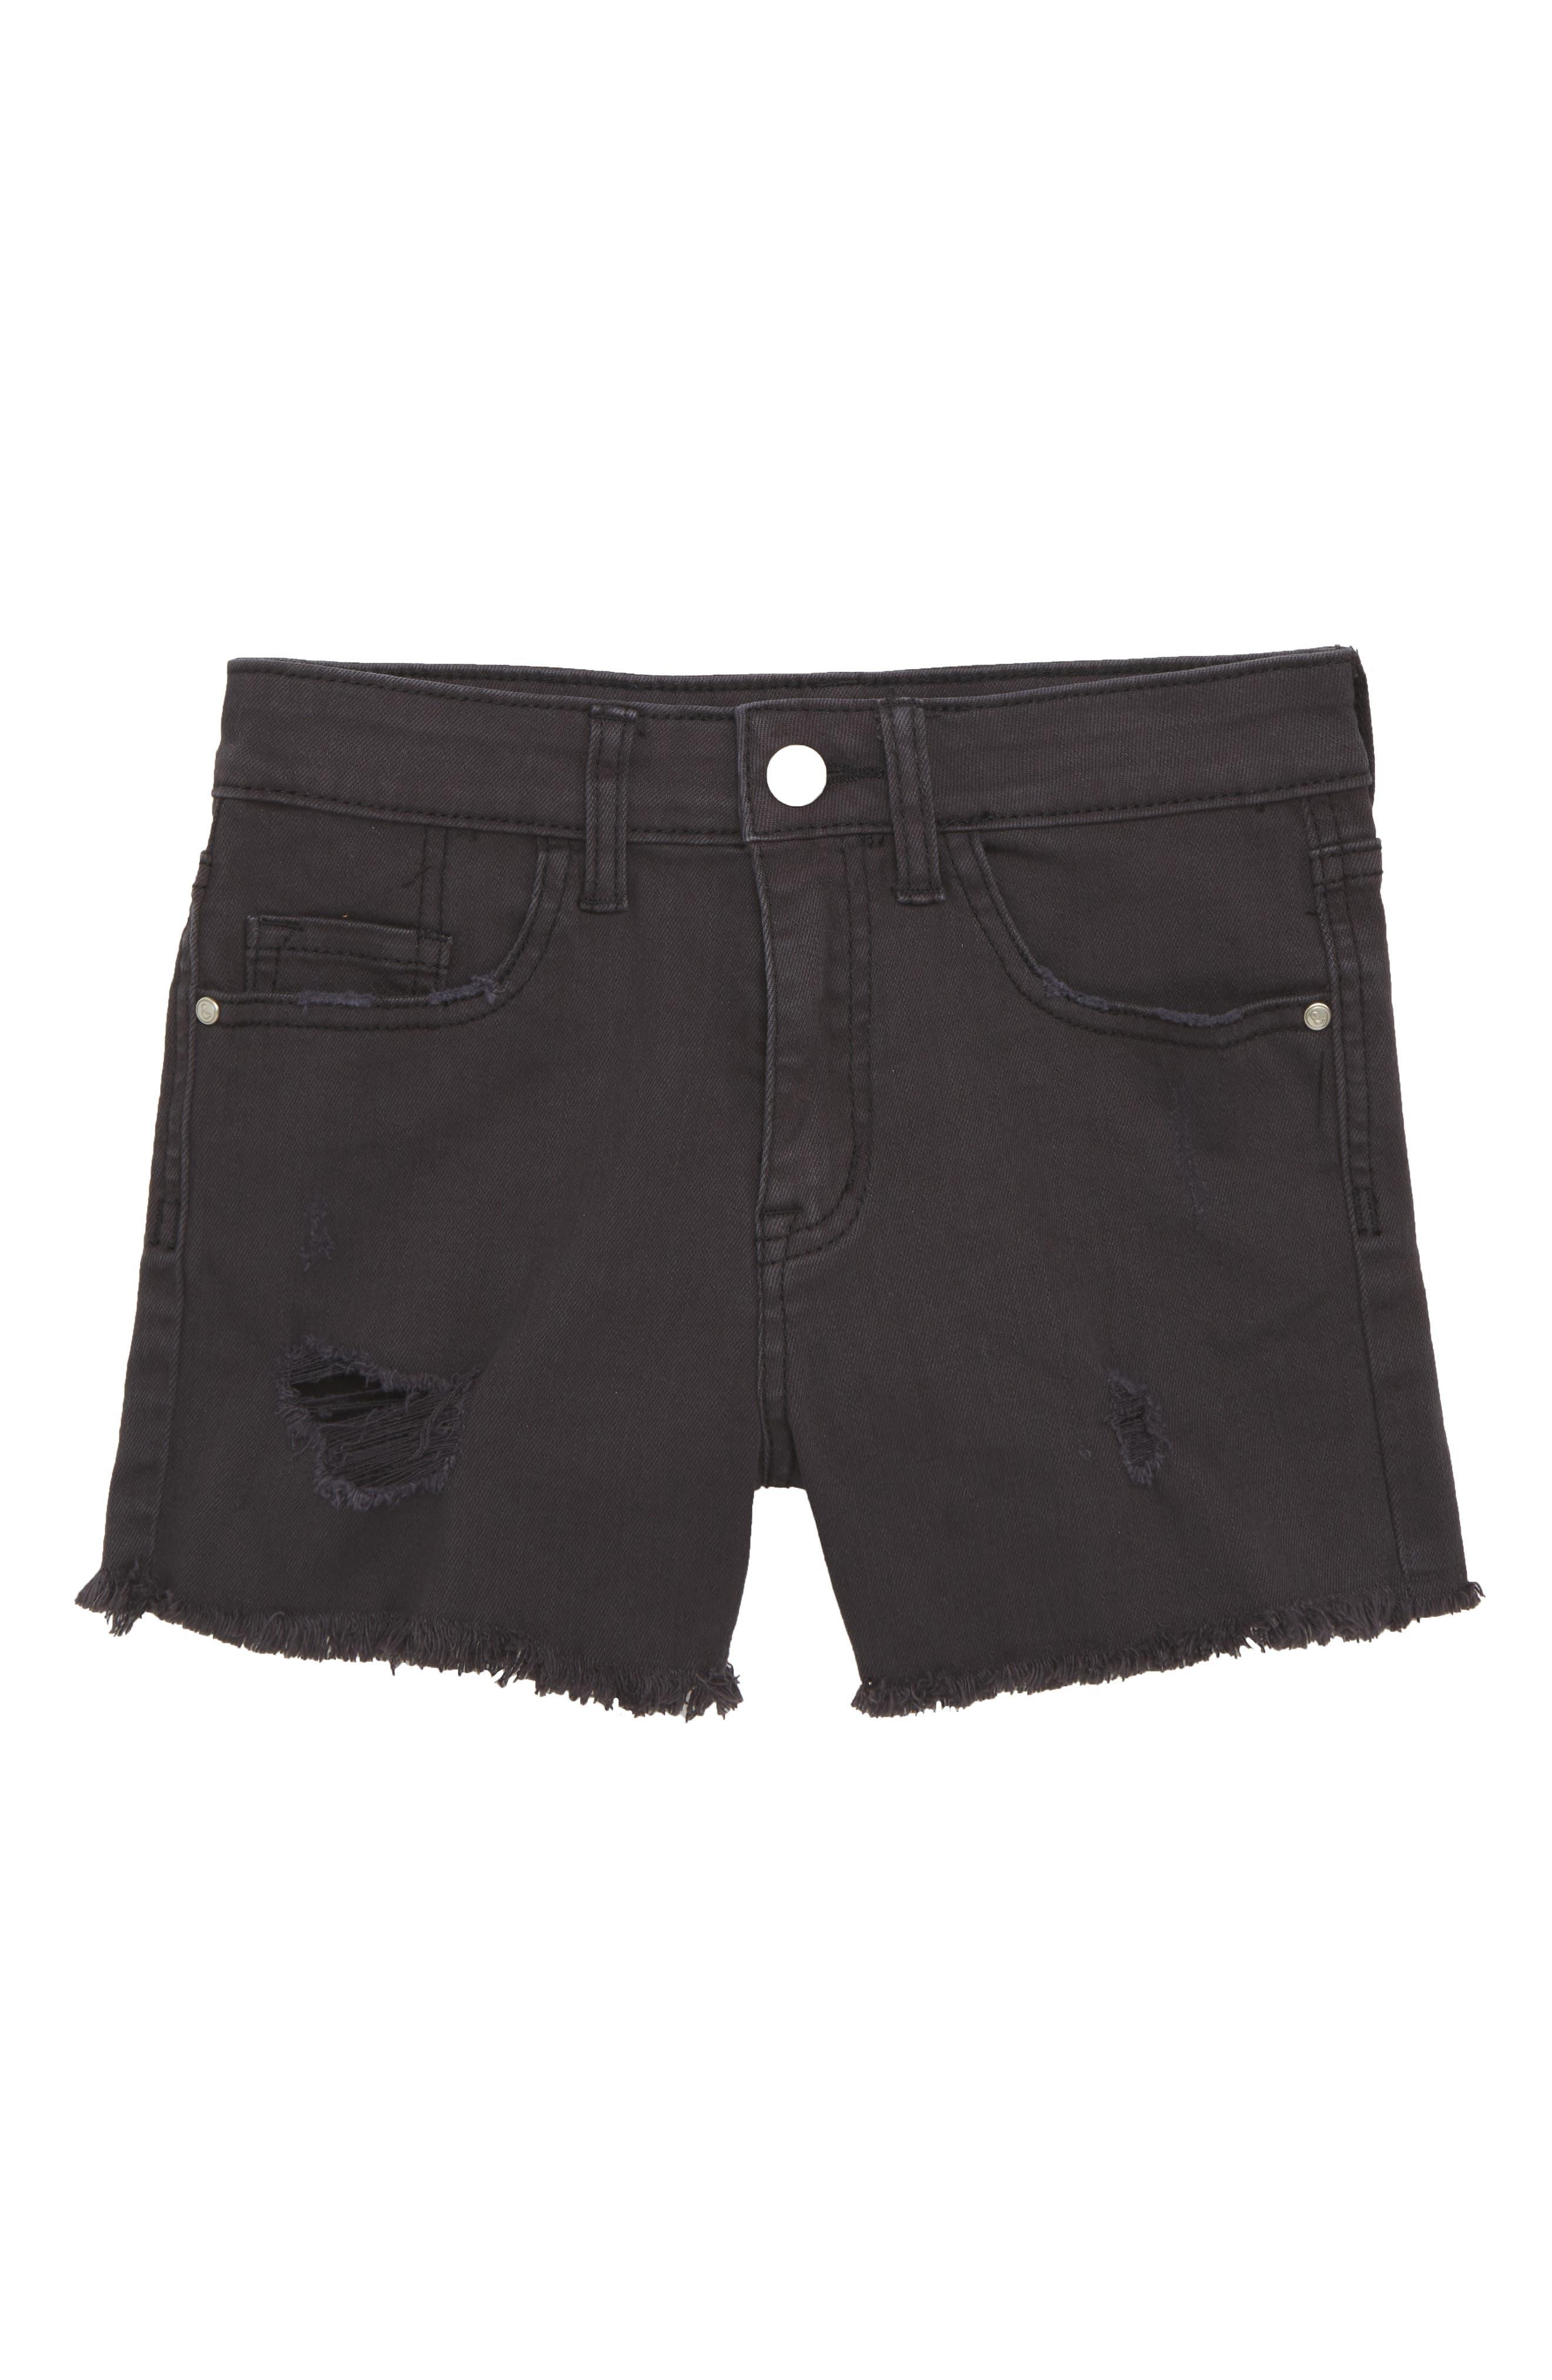 Distressed Cutoff Denim Shorts,                         Main,                         color, BLACK